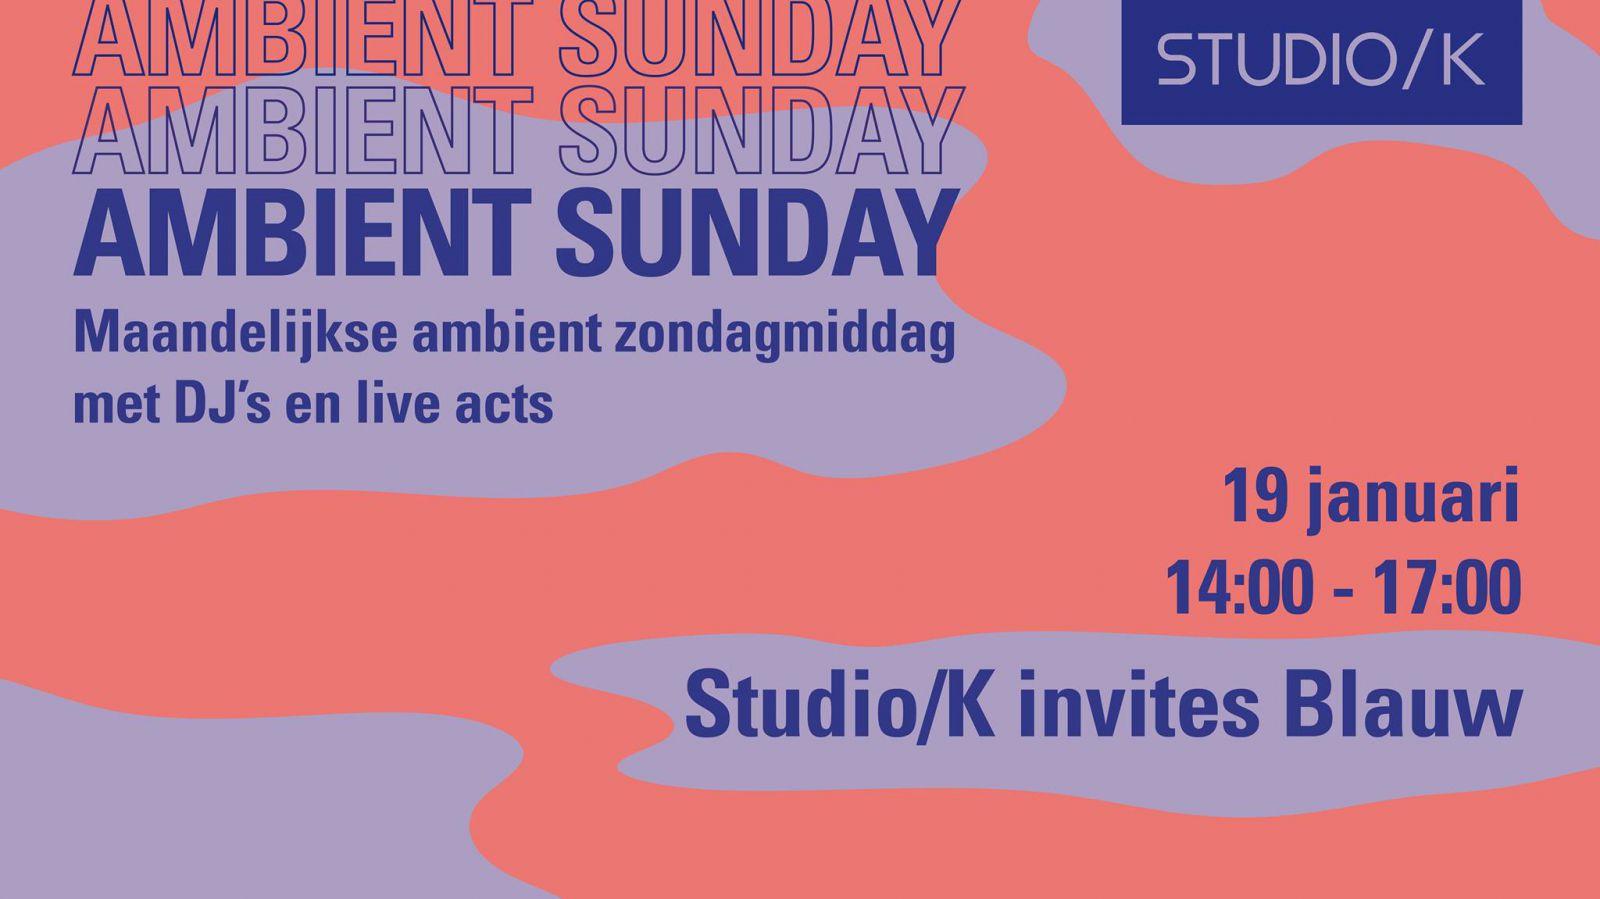 Ambient Sunday: /K Invites Blauw